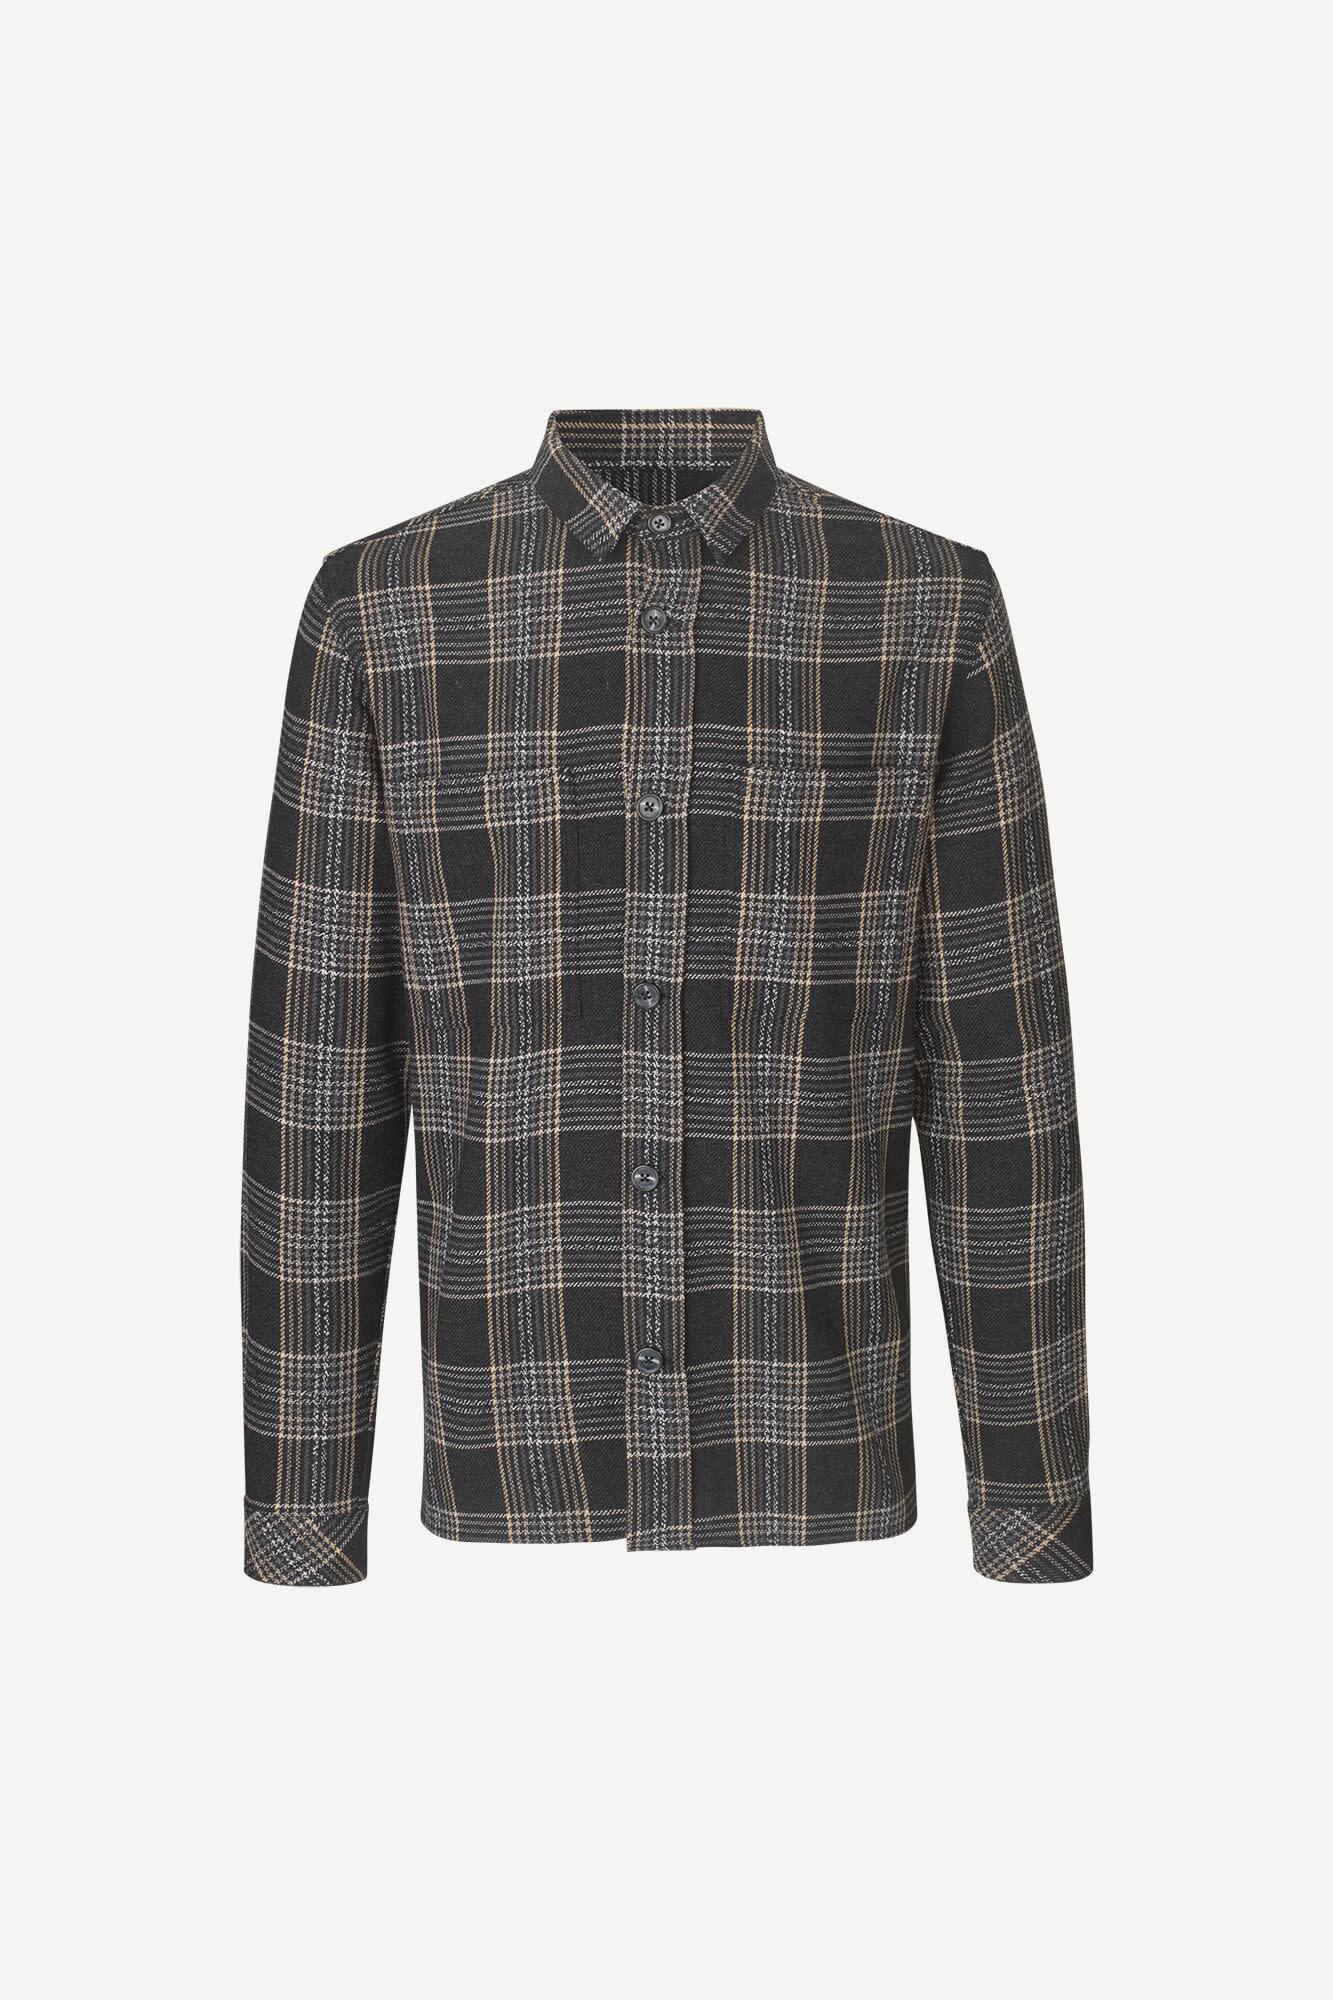 Waltones O Overshirt Black Checker  11703-1